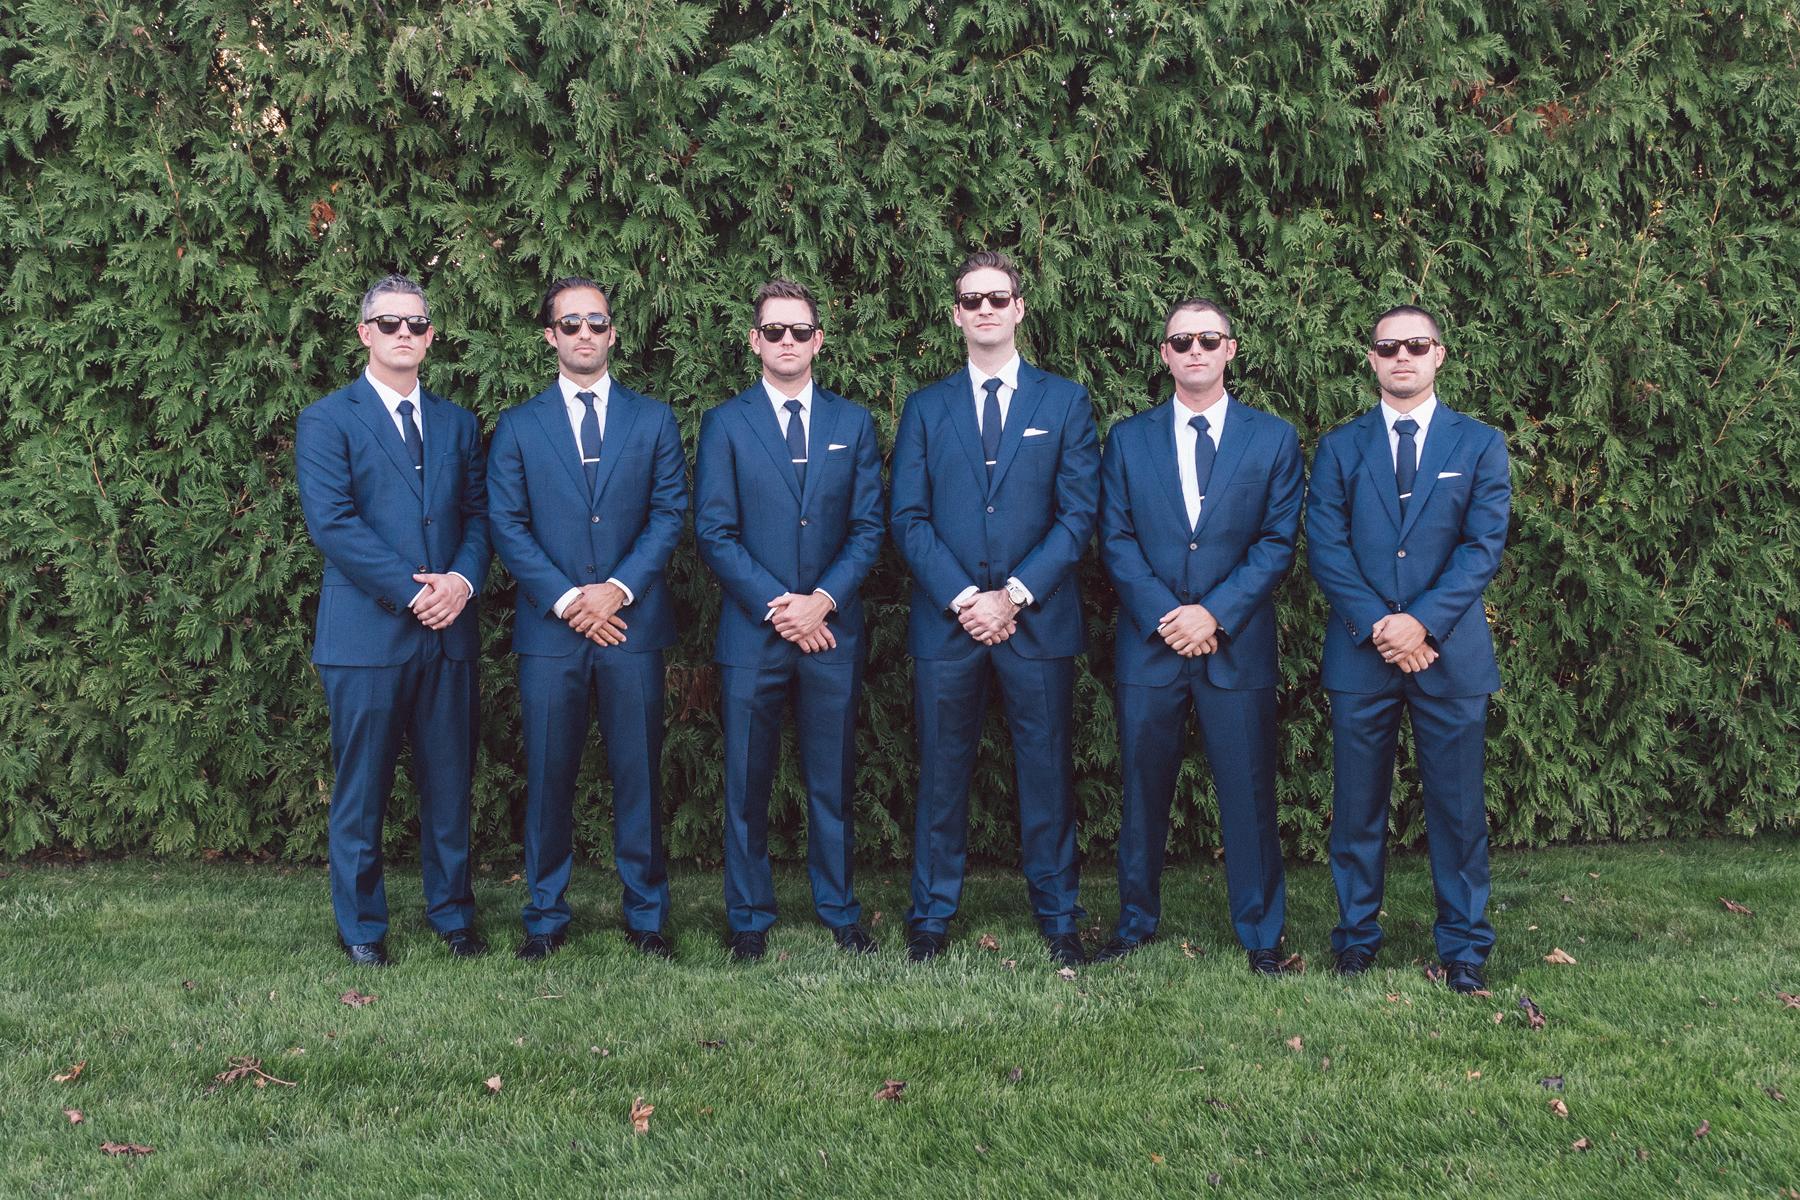 Navy Suits | Bay Harbor Michigan | Groomsmen | Northern Michigan Wedding Planning | Tableau Events